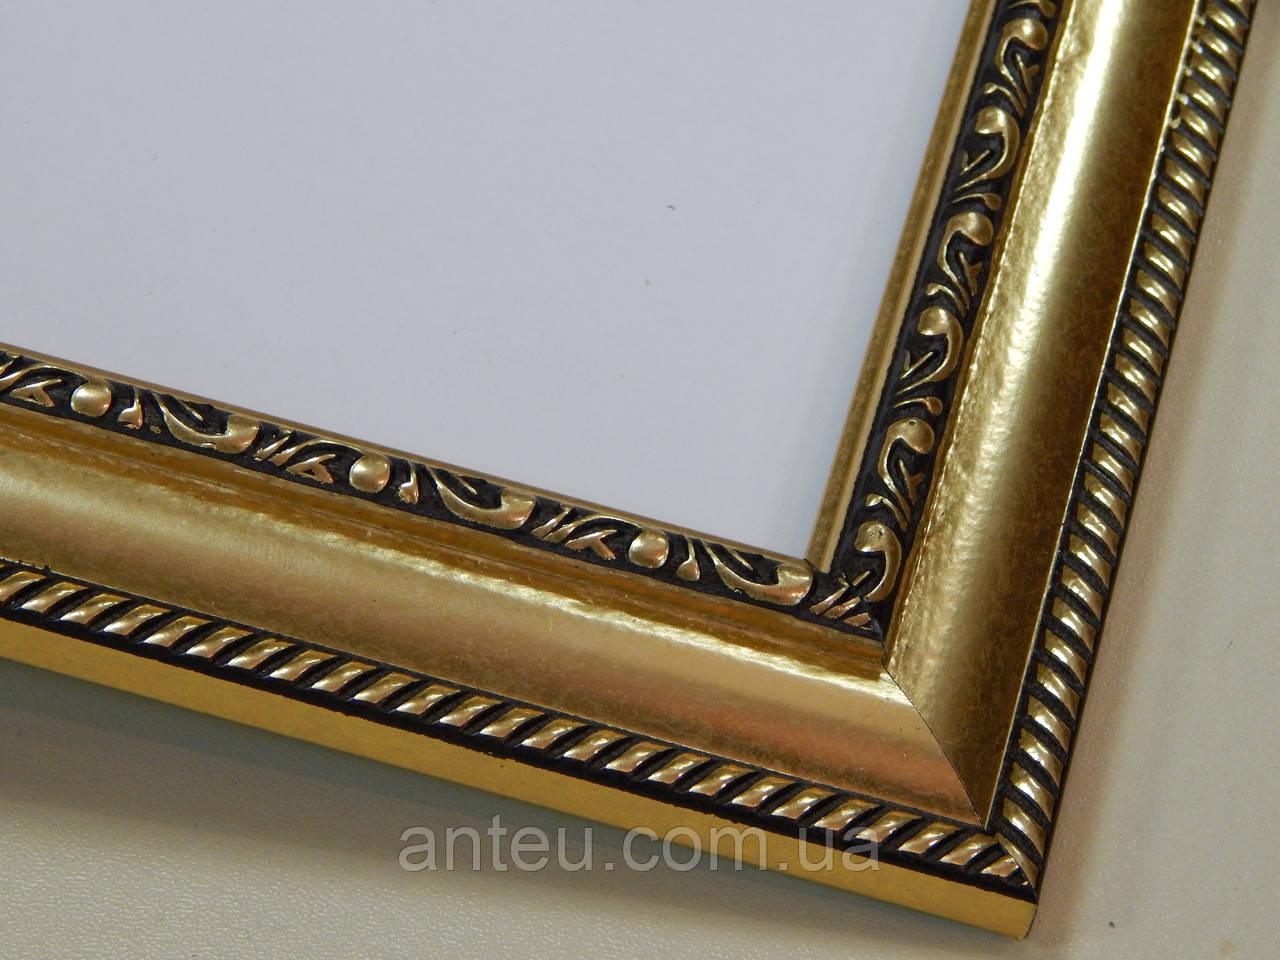 Фоторамка 20х30.29 мм.золото с орнаментом.Для фото ,грамот,картин.